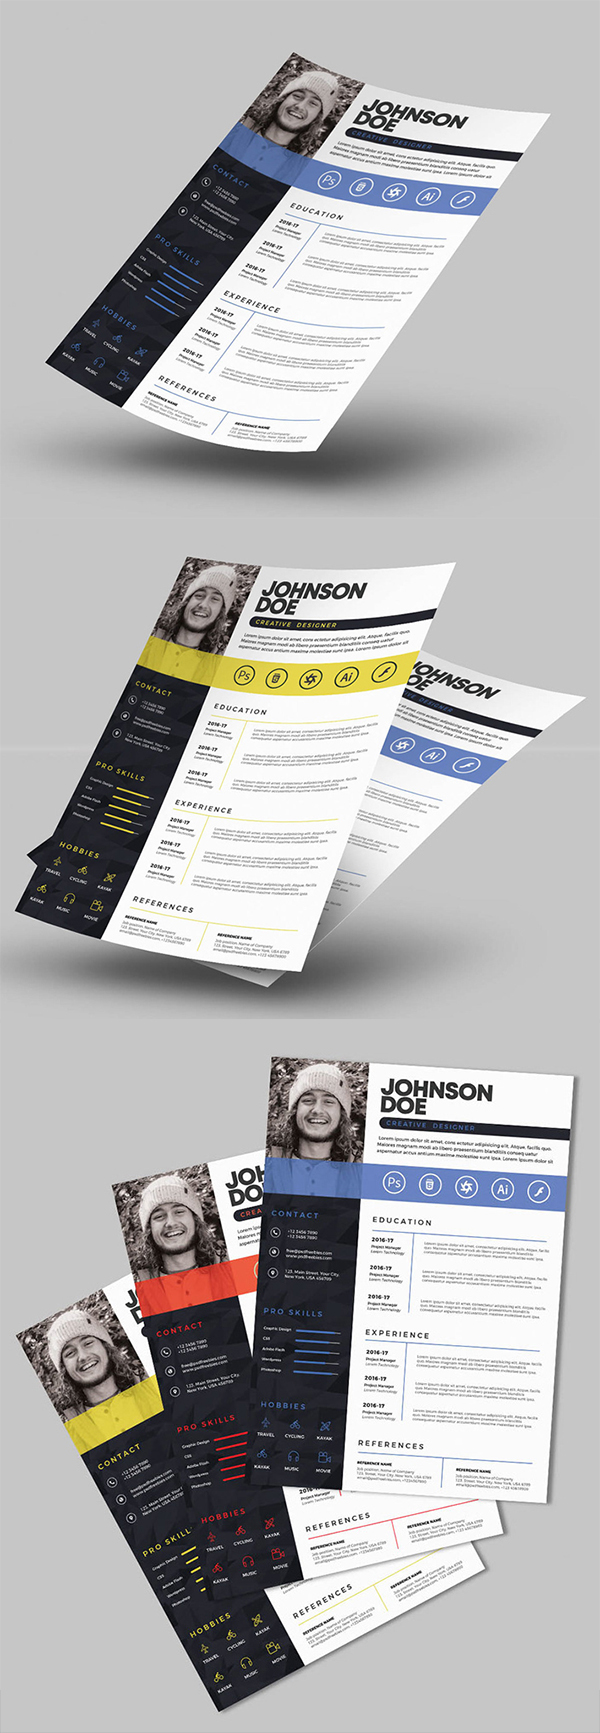 Free Download Creative Resume / CV Template Design (3 Color Options)